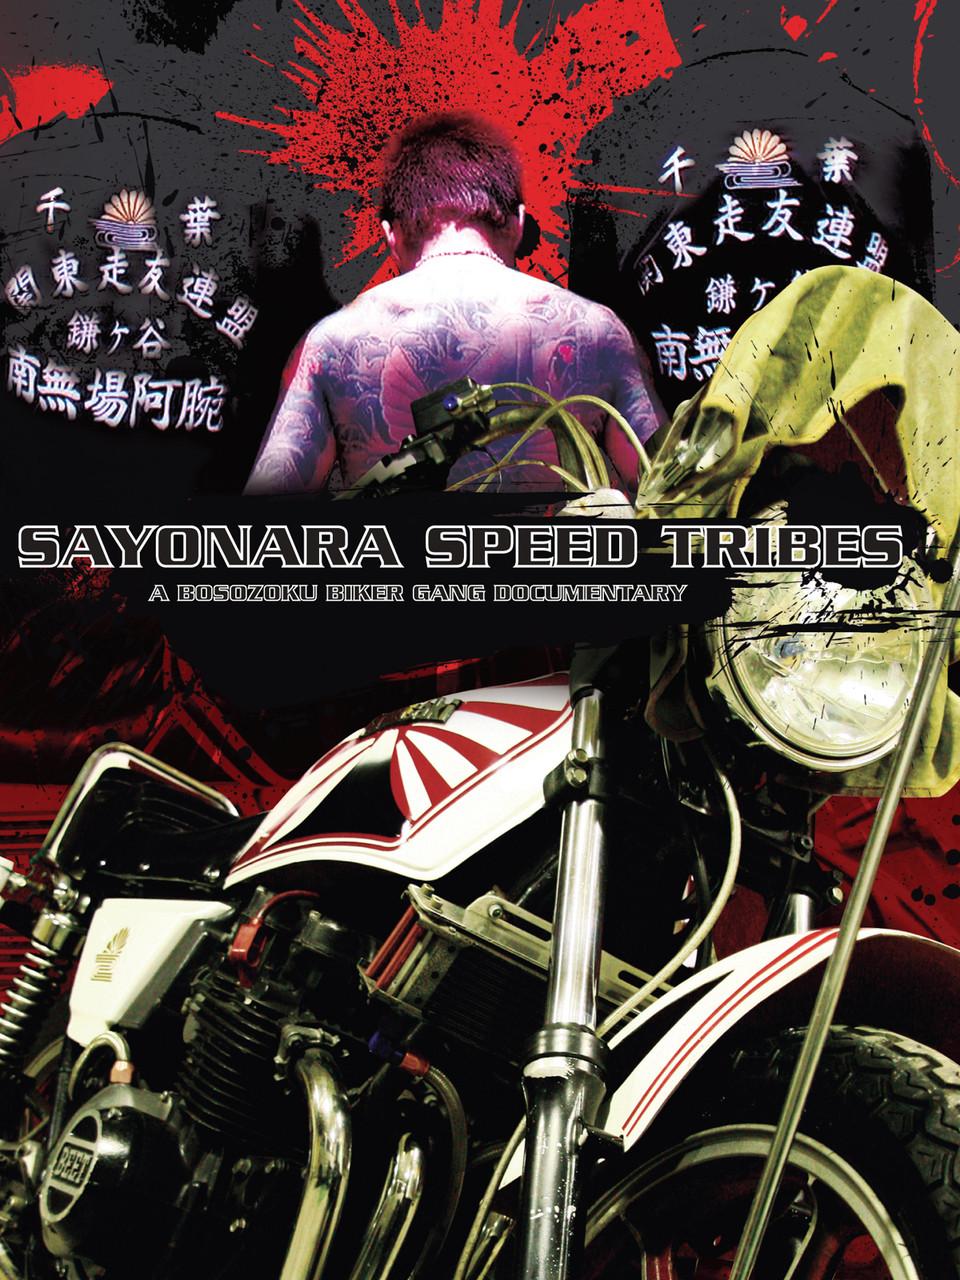 sayonara speed tribes full movie download choppertown. Black Bedroom Furniture Sets. Home Design Ideas